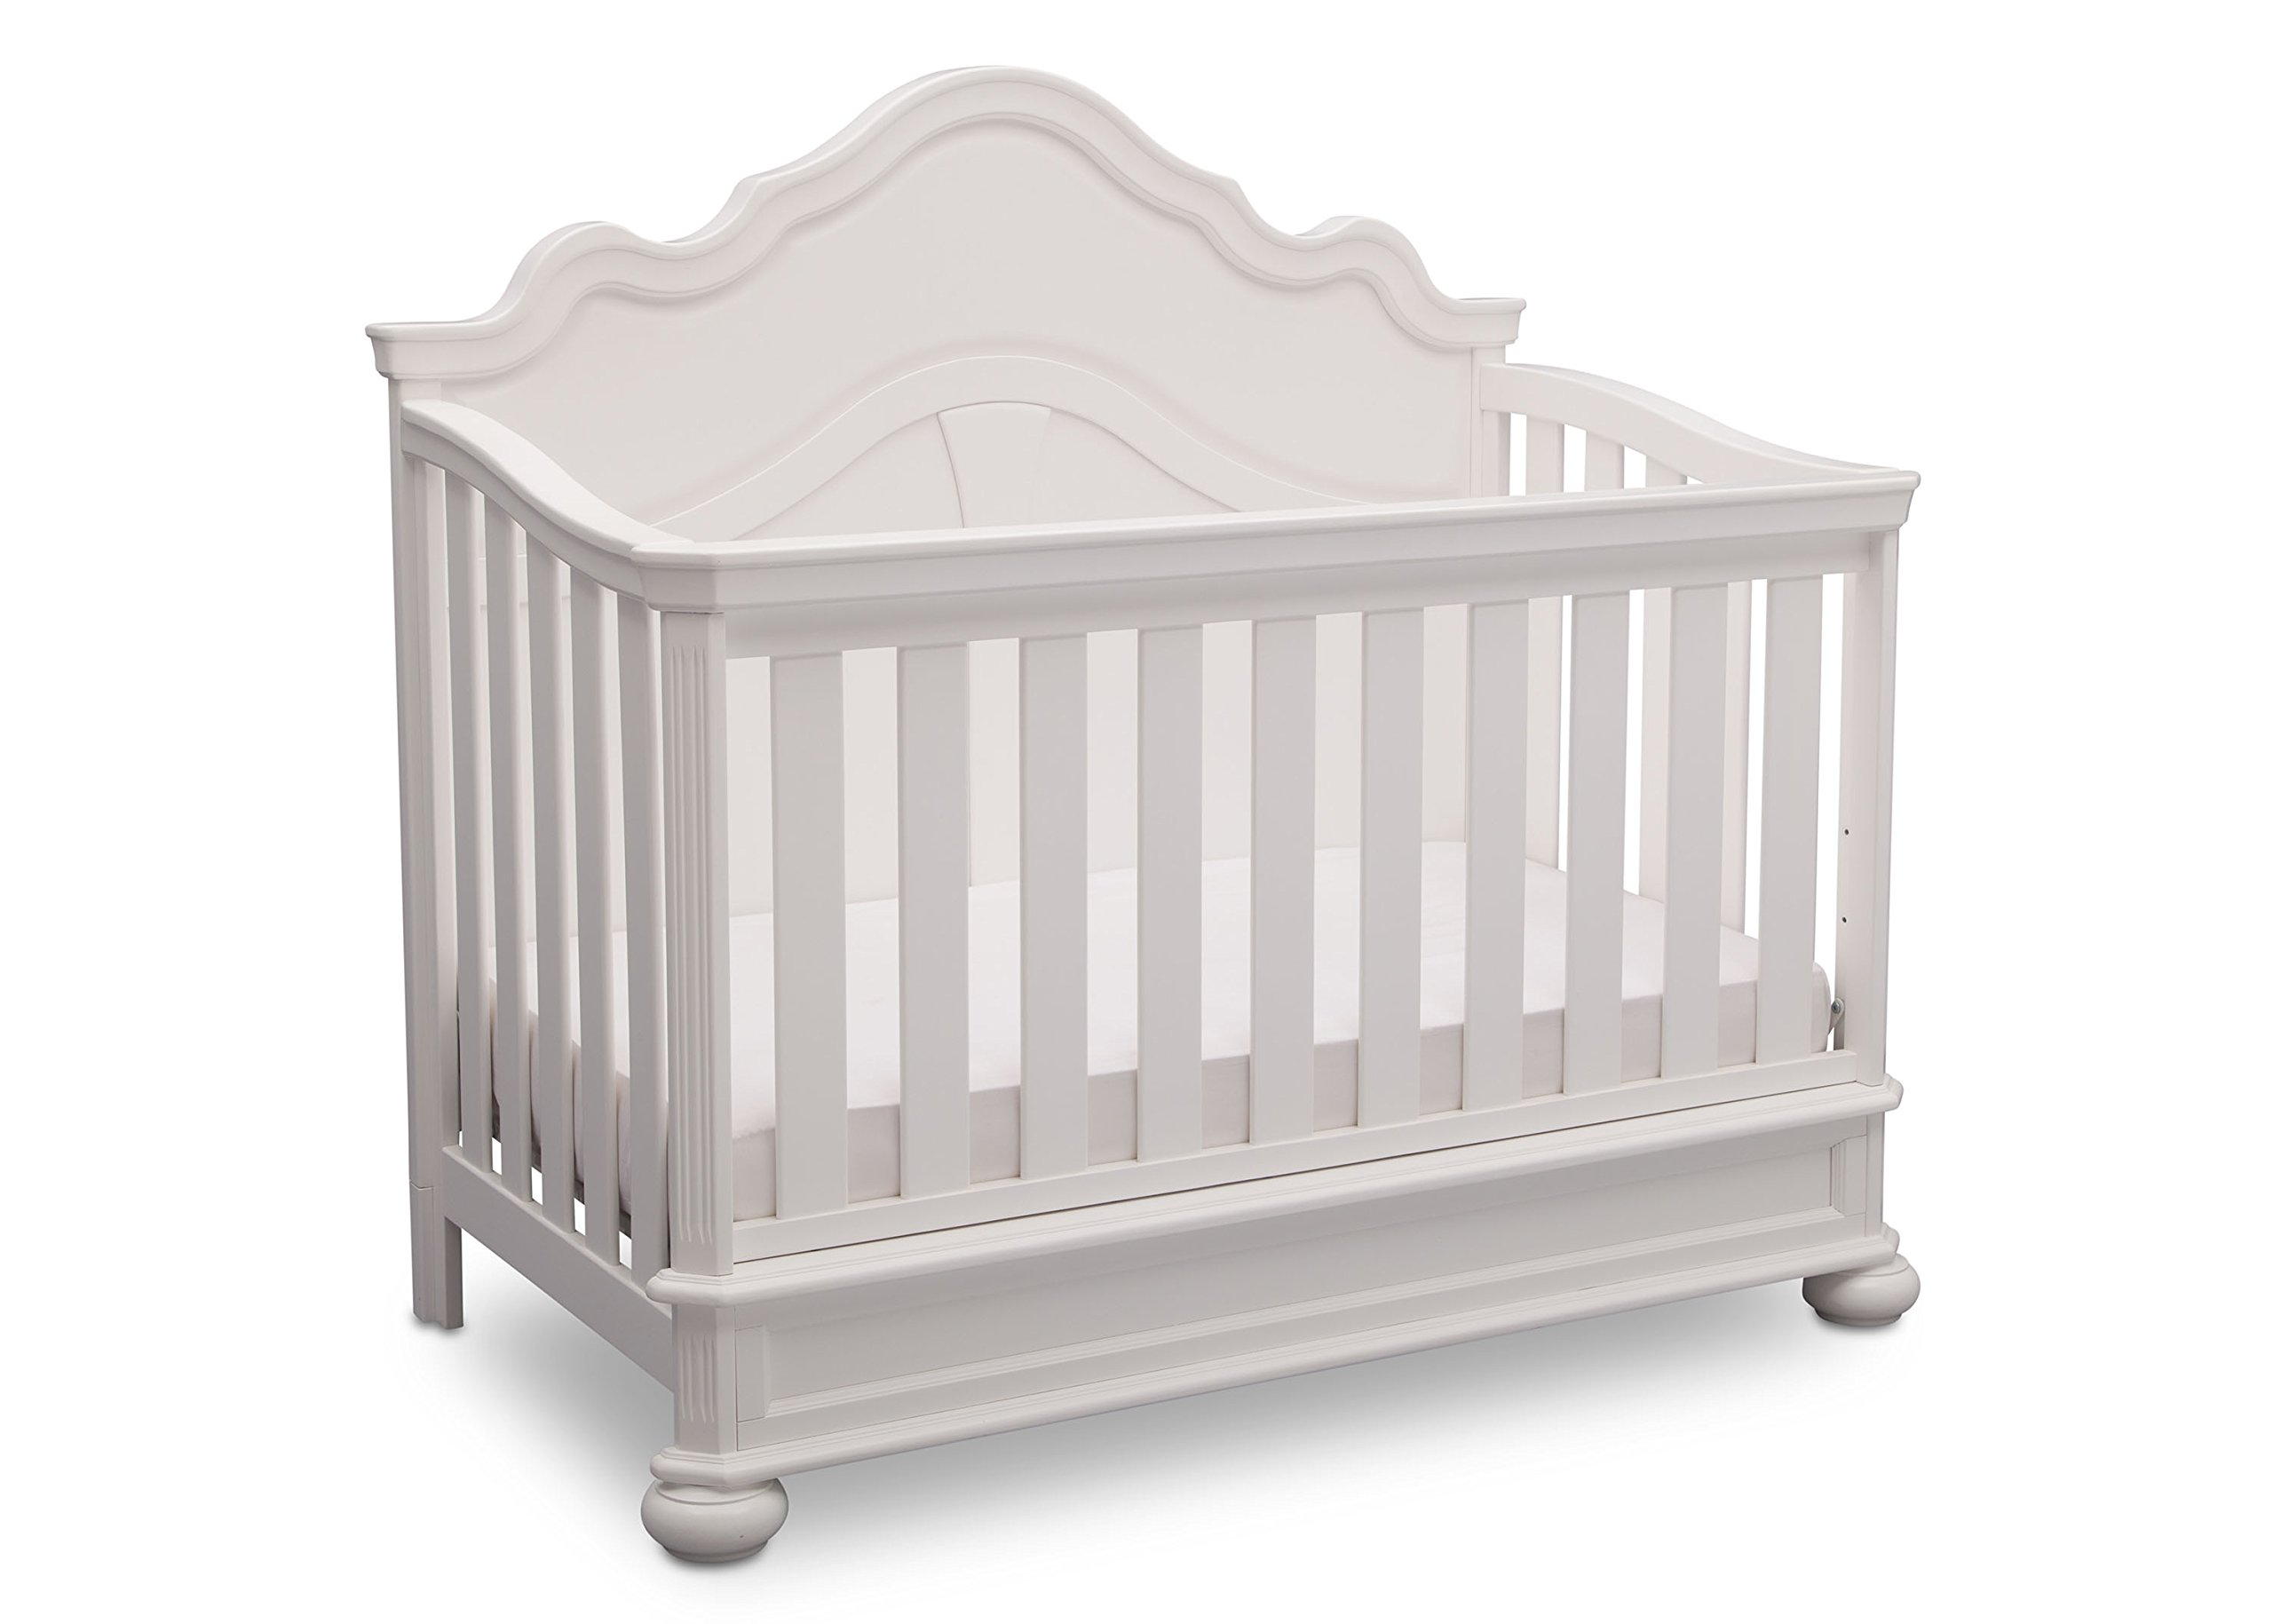 Simmons Kids Peyton 6-Piece Nursery Furniture Set (Convertible Crib, Dresser, Chest, Changing Top, Toddler Guardrail, Full Size Conversion), Bianca White by Delta Children (Image #3)